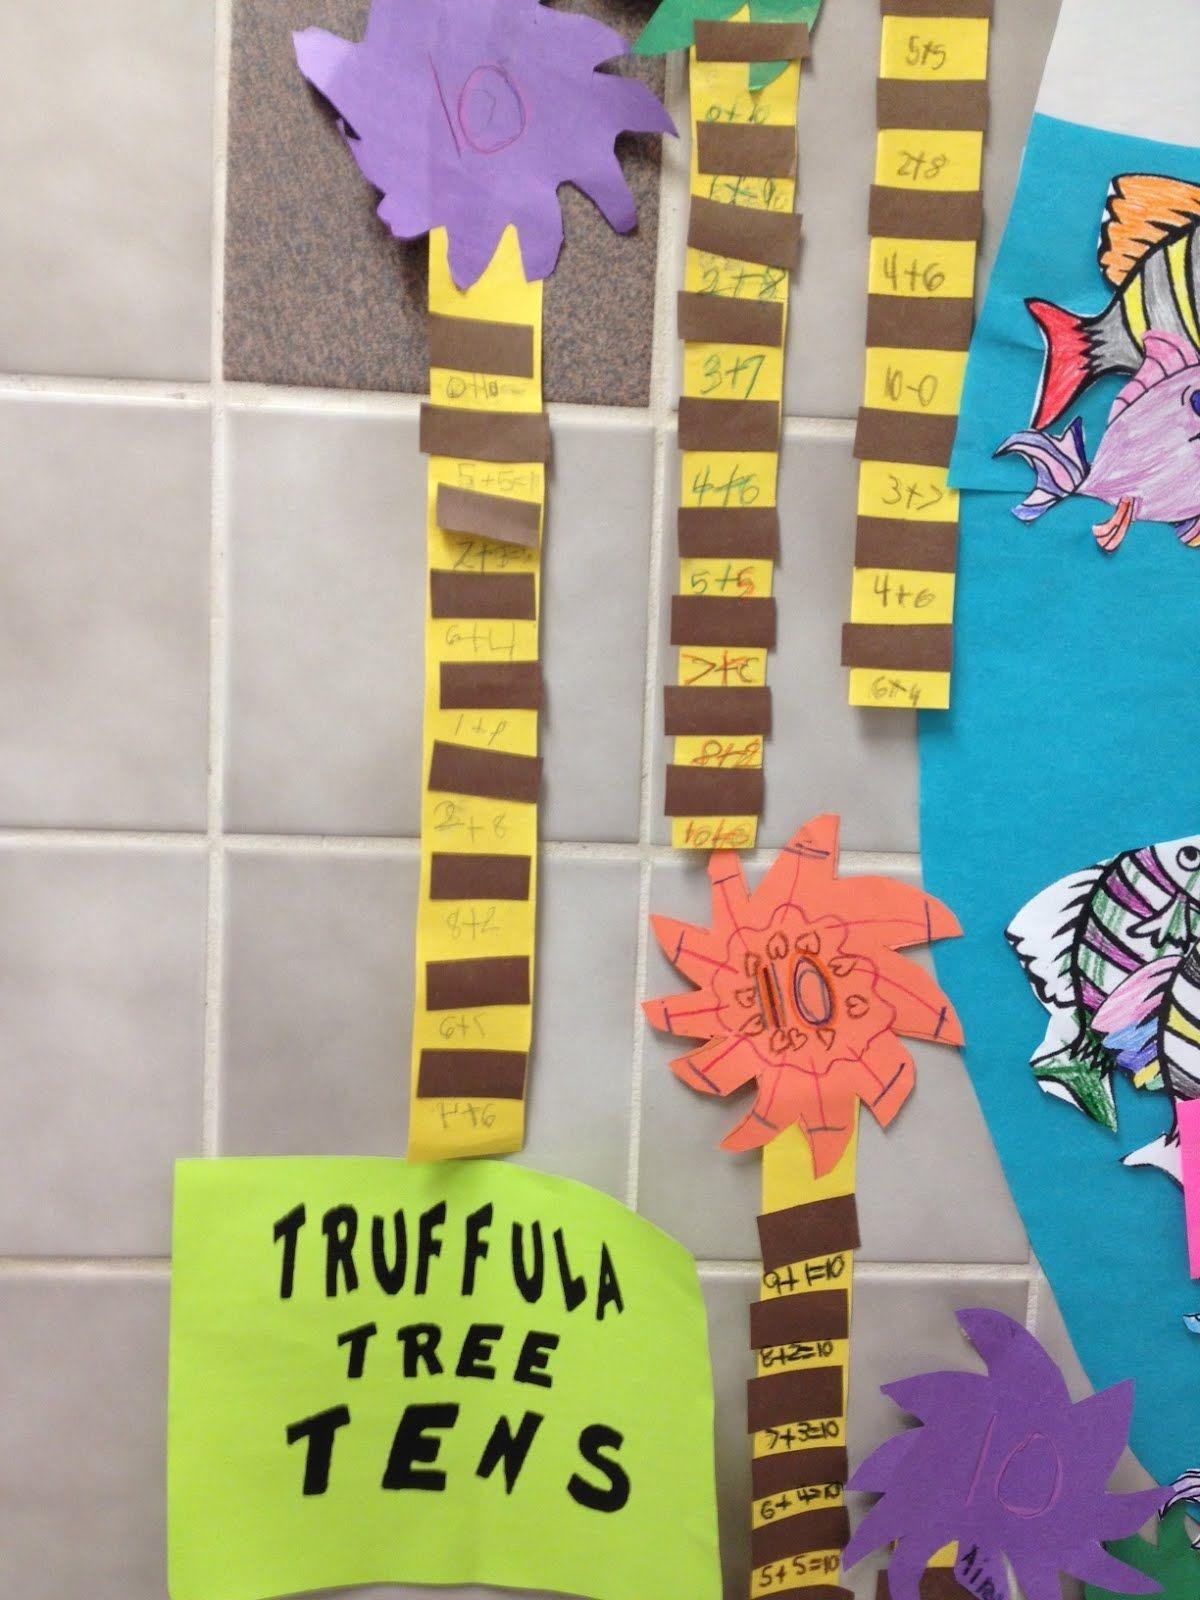 Seuss Truffula Tens 1 200 1 600 Pixels